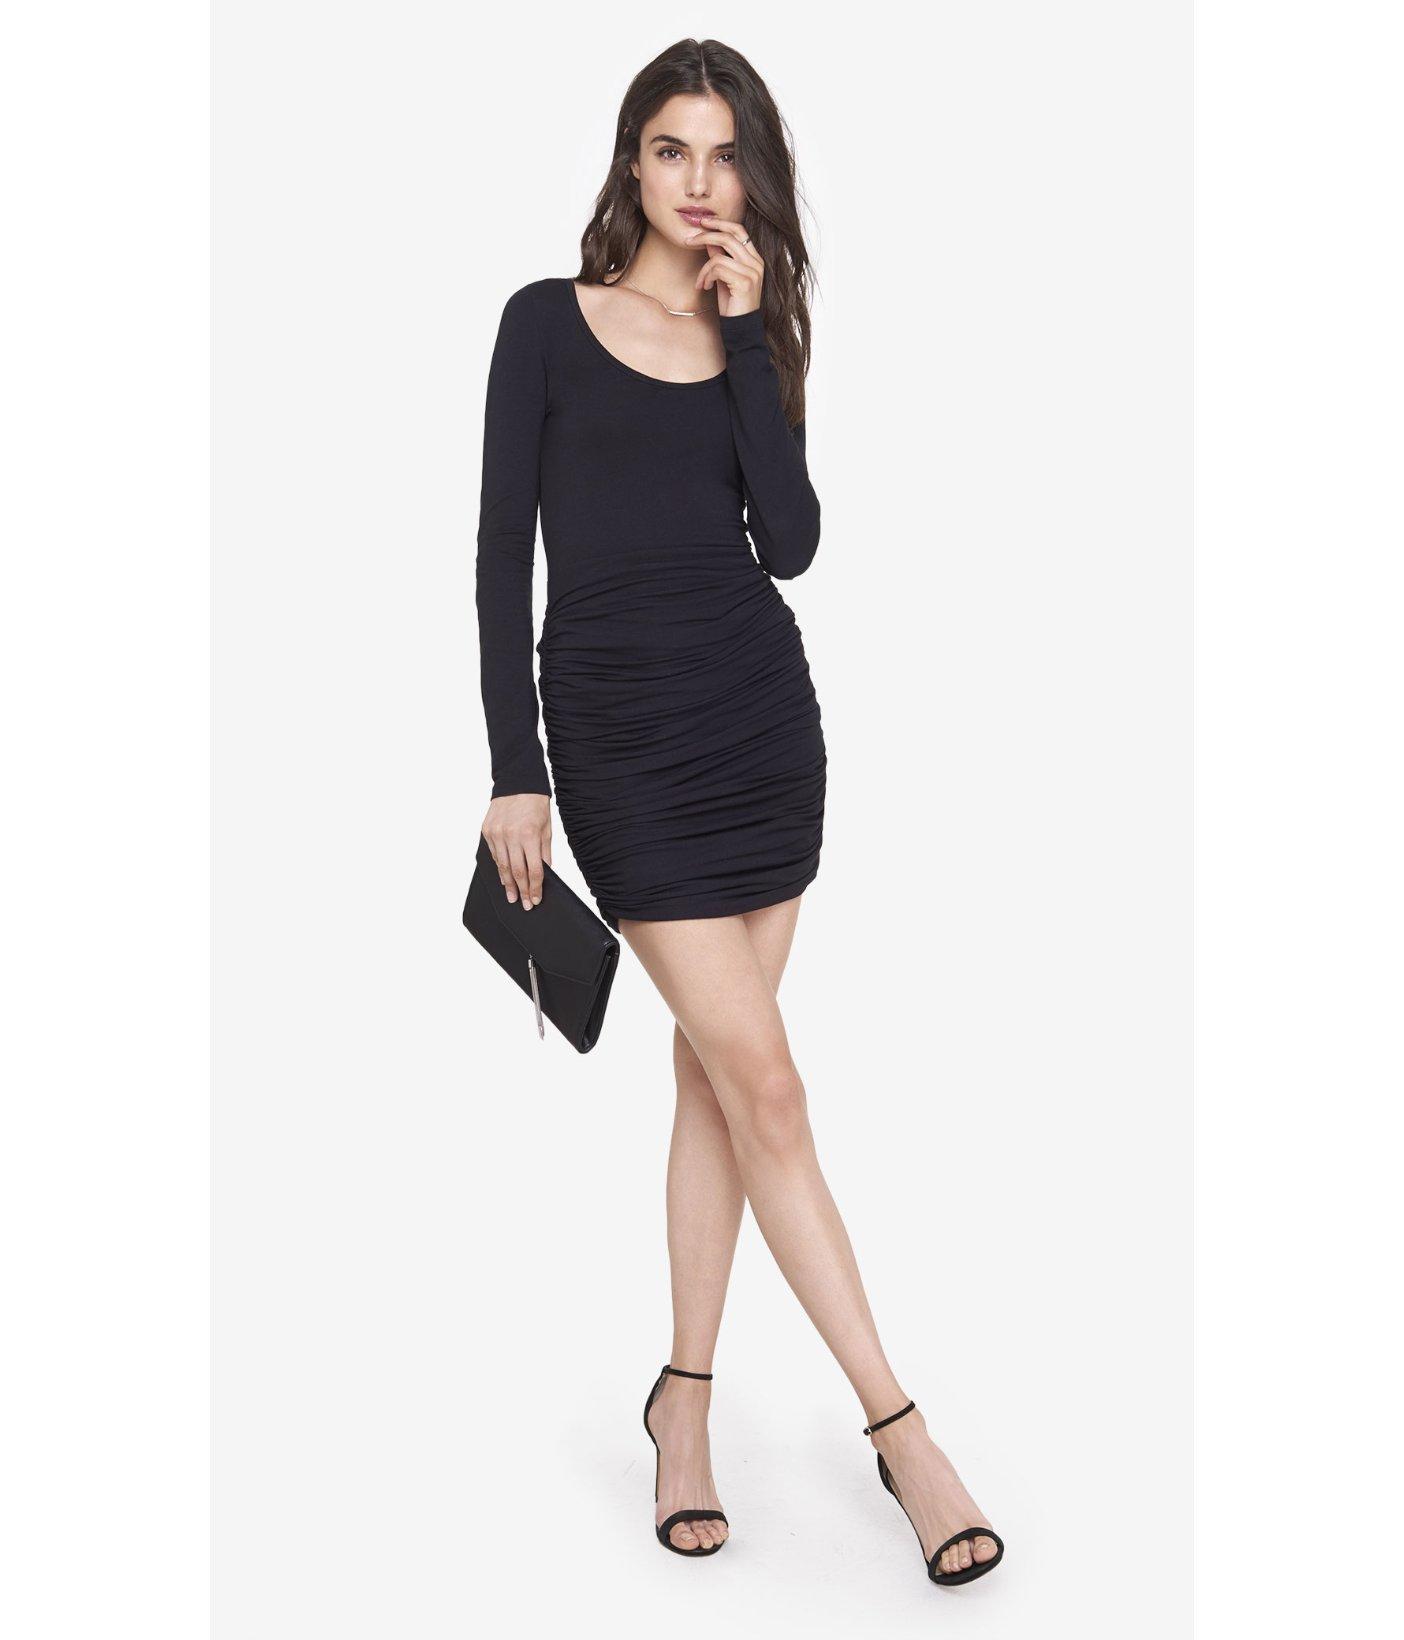 95b9fb22b5255 Express Black Long Sleeve Ruched Dress in Black - Lyst